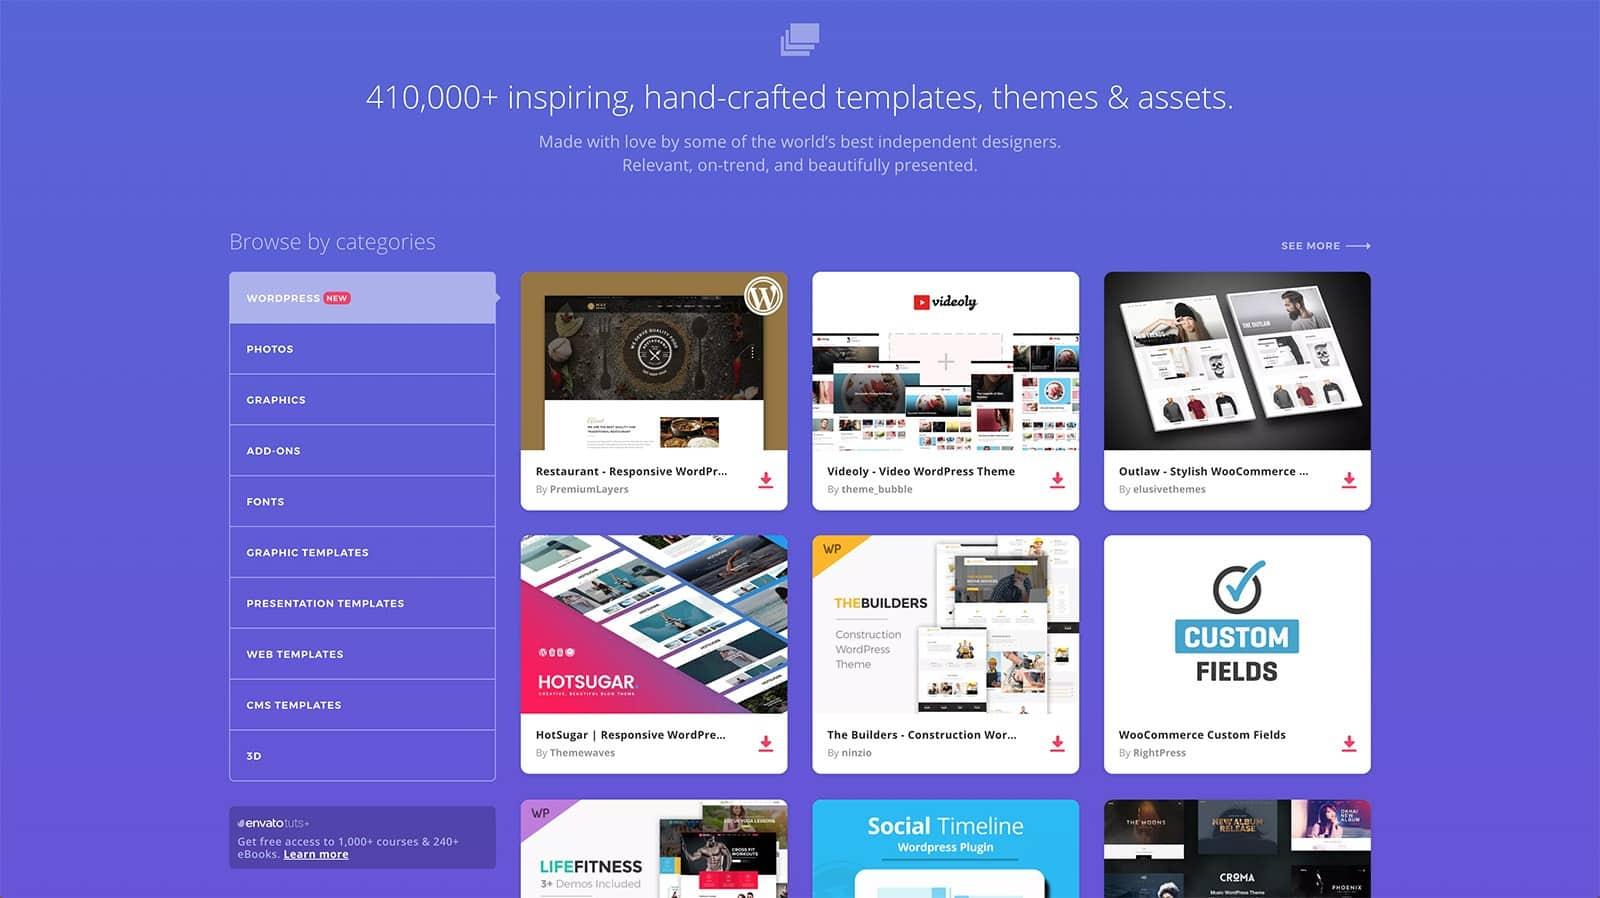 La page de contenus WordPress de Envato Elements